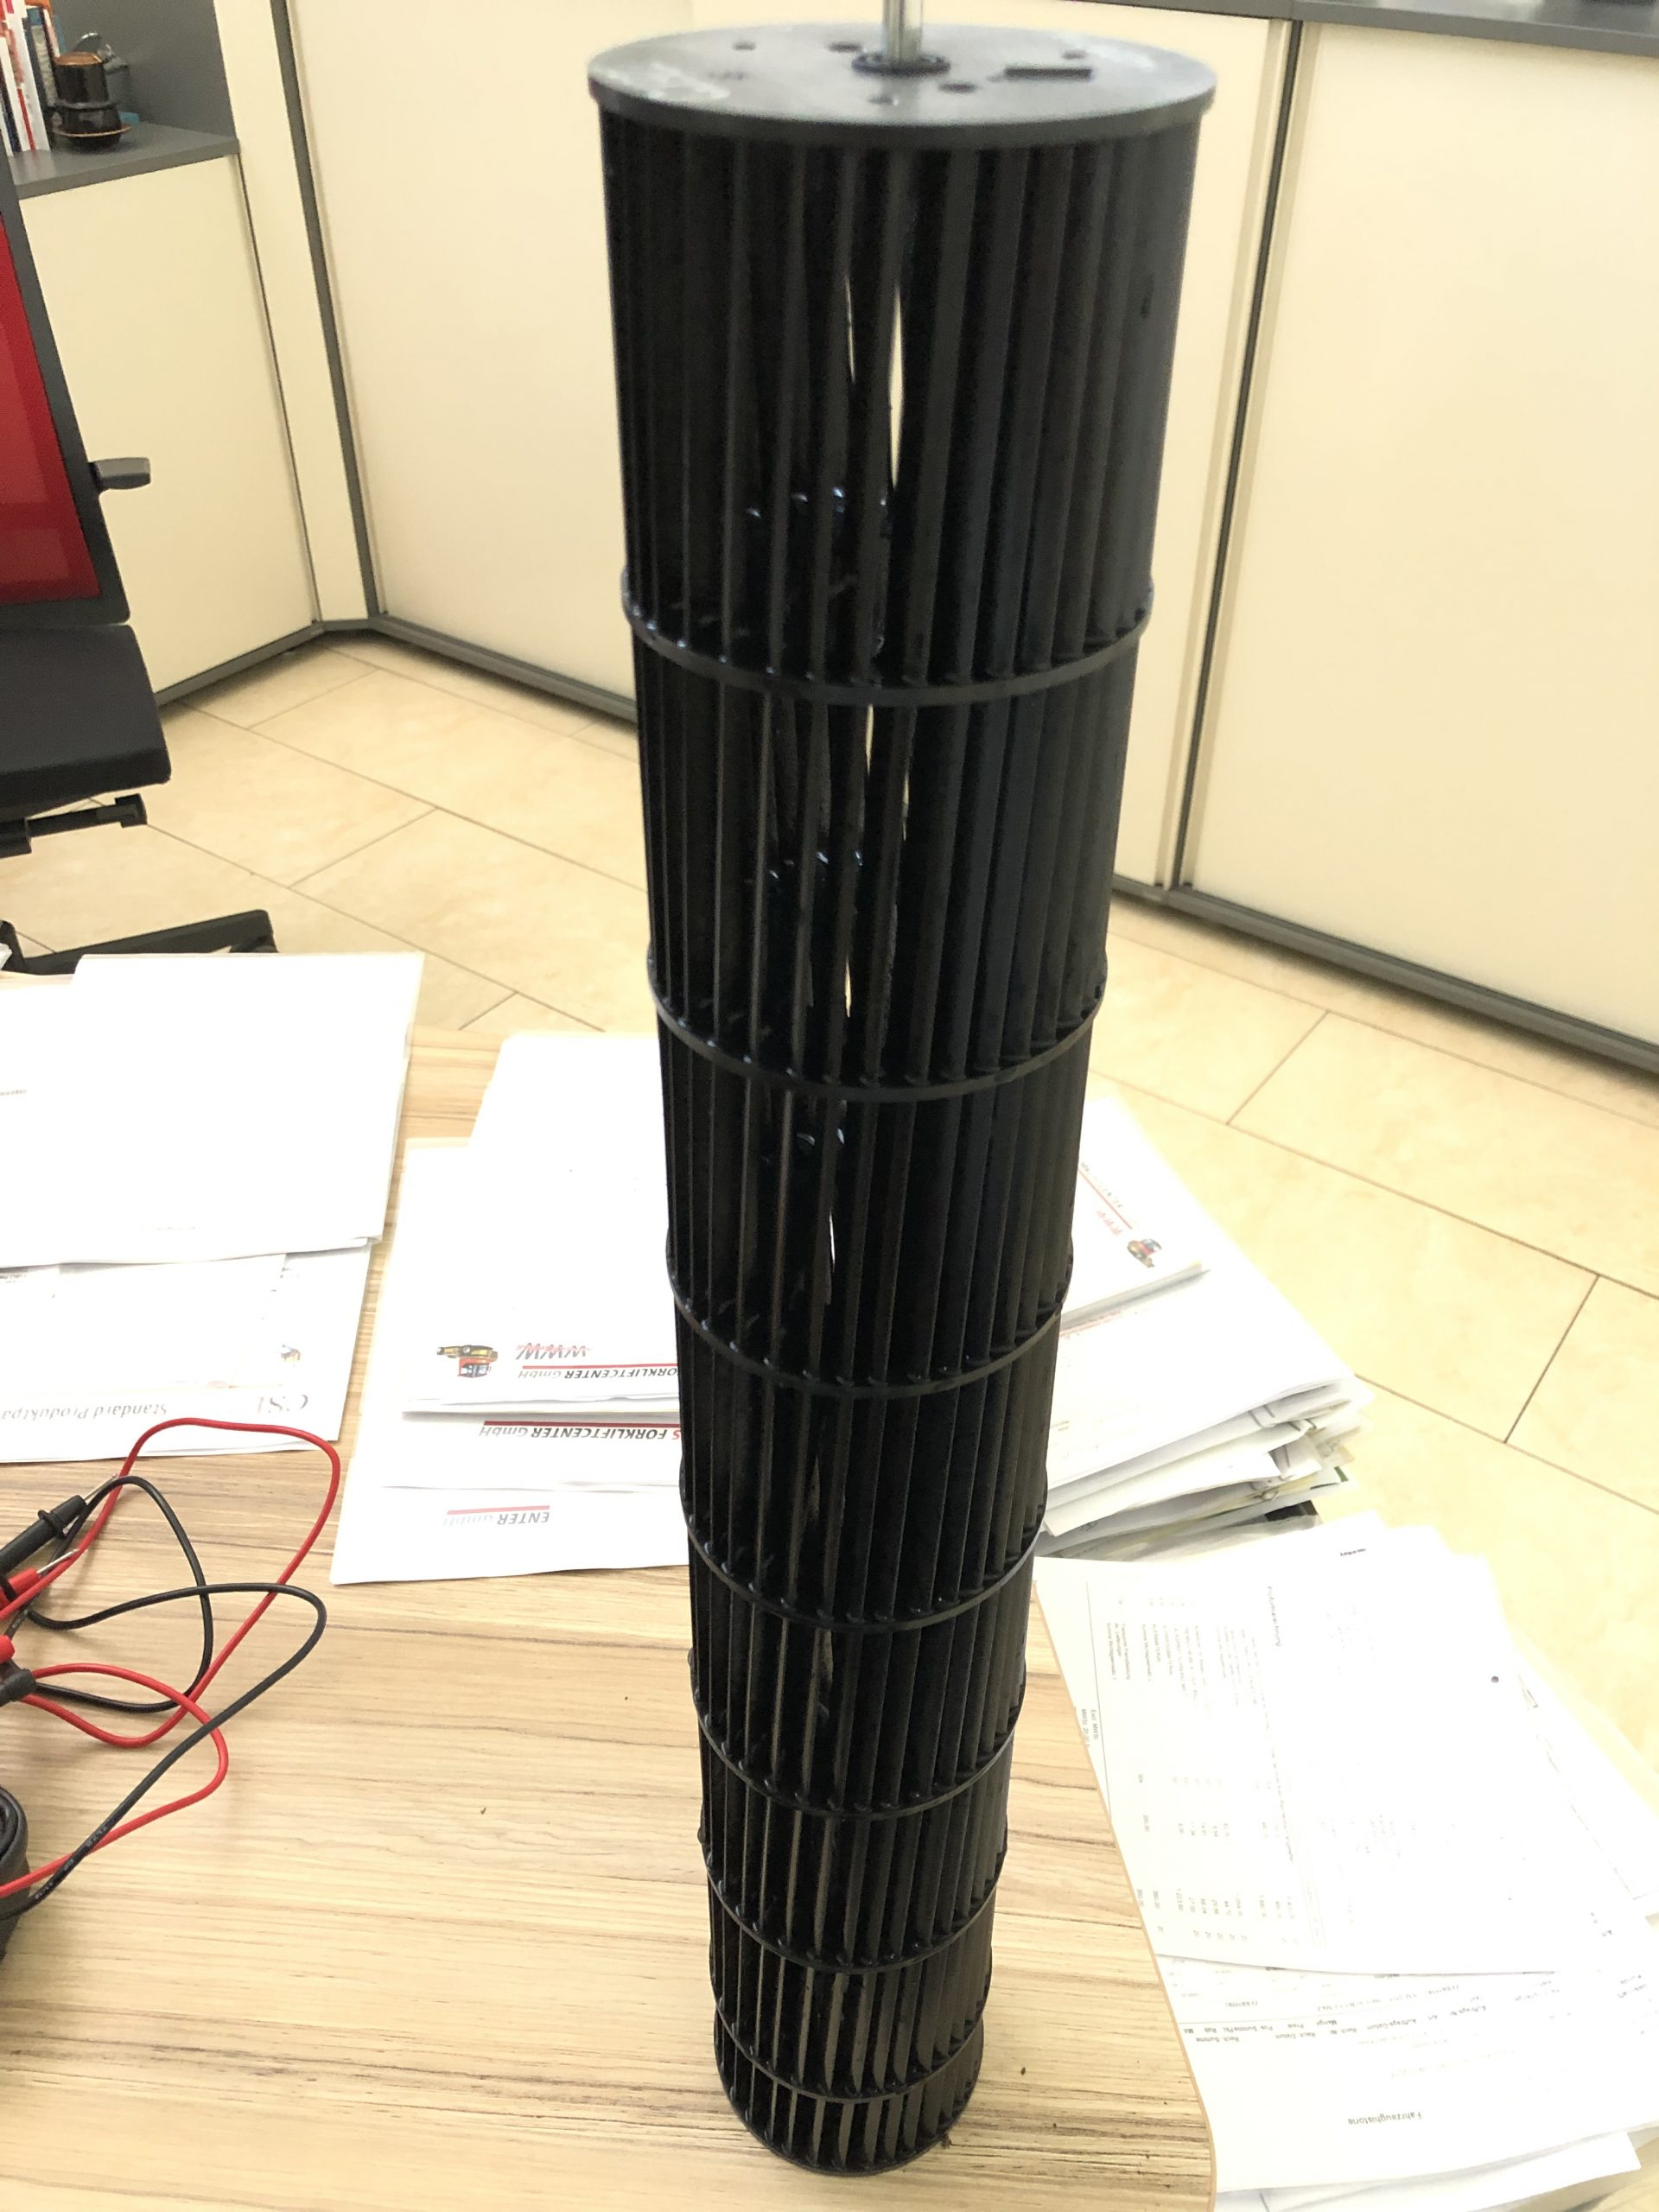 Klimaanlage Filter sauber